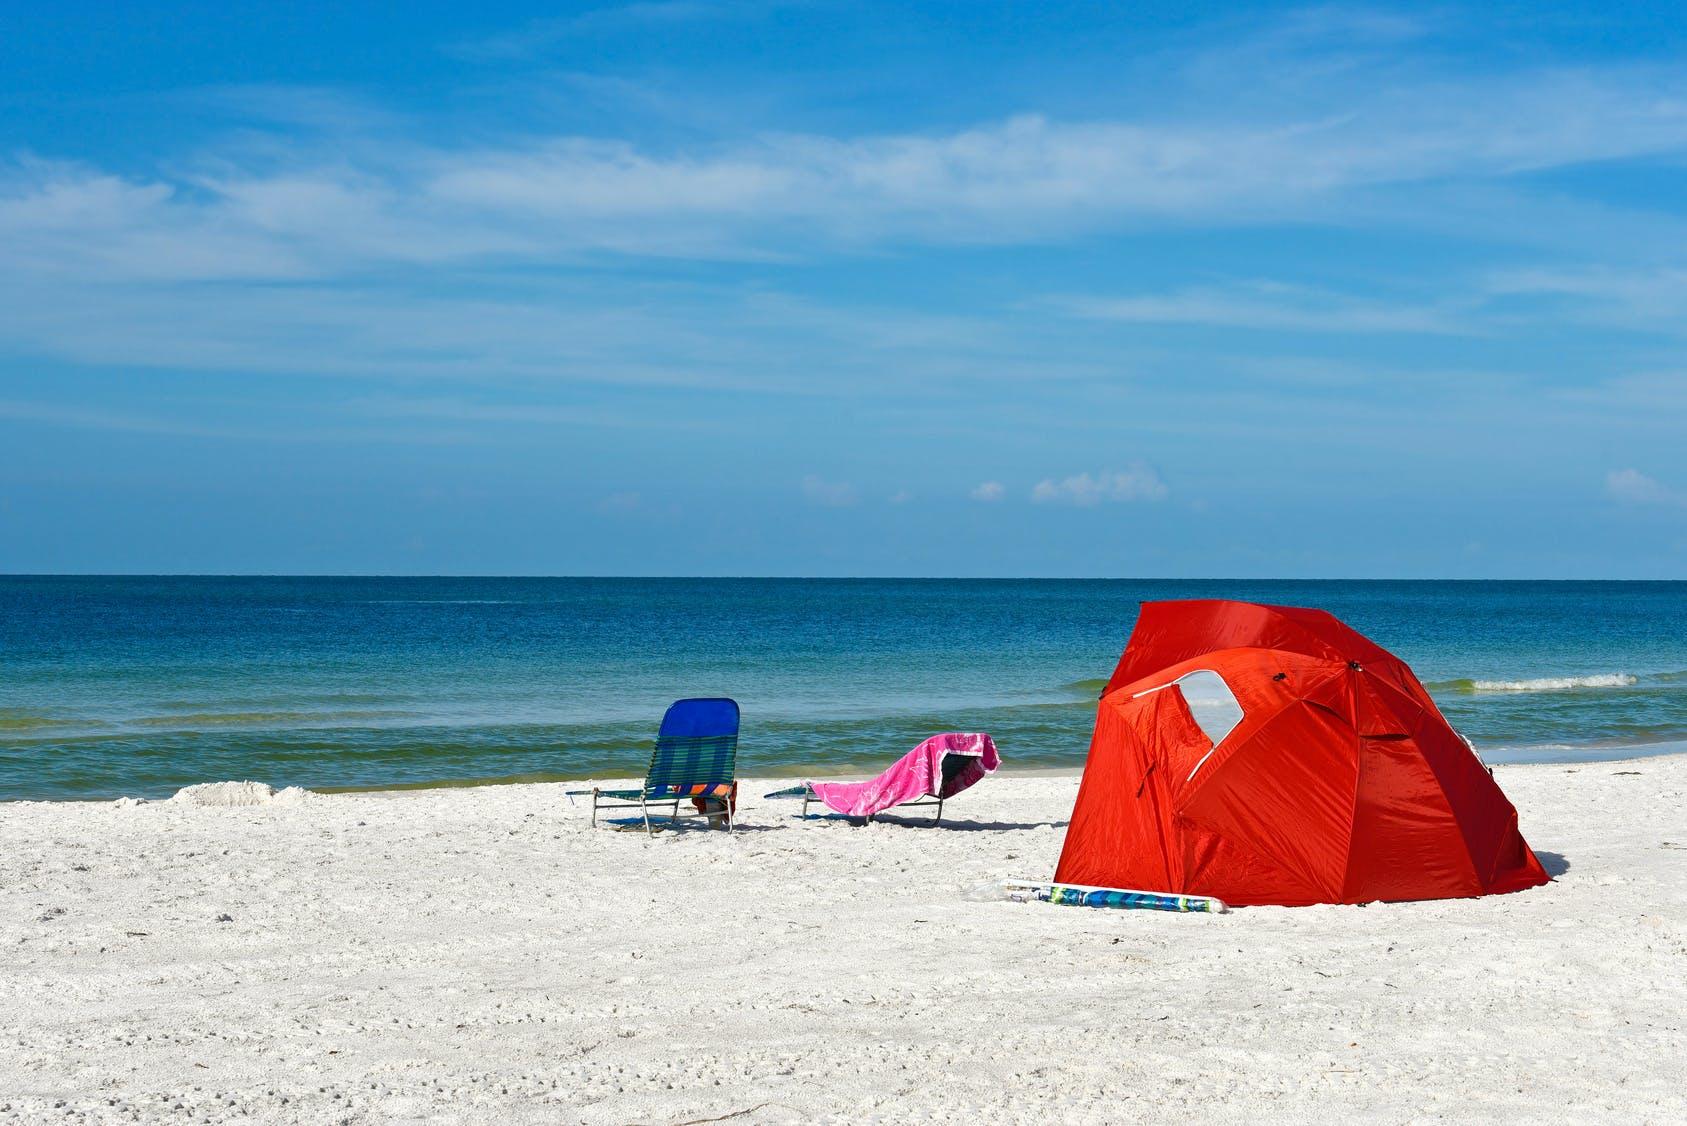 tente anti uv sur plage